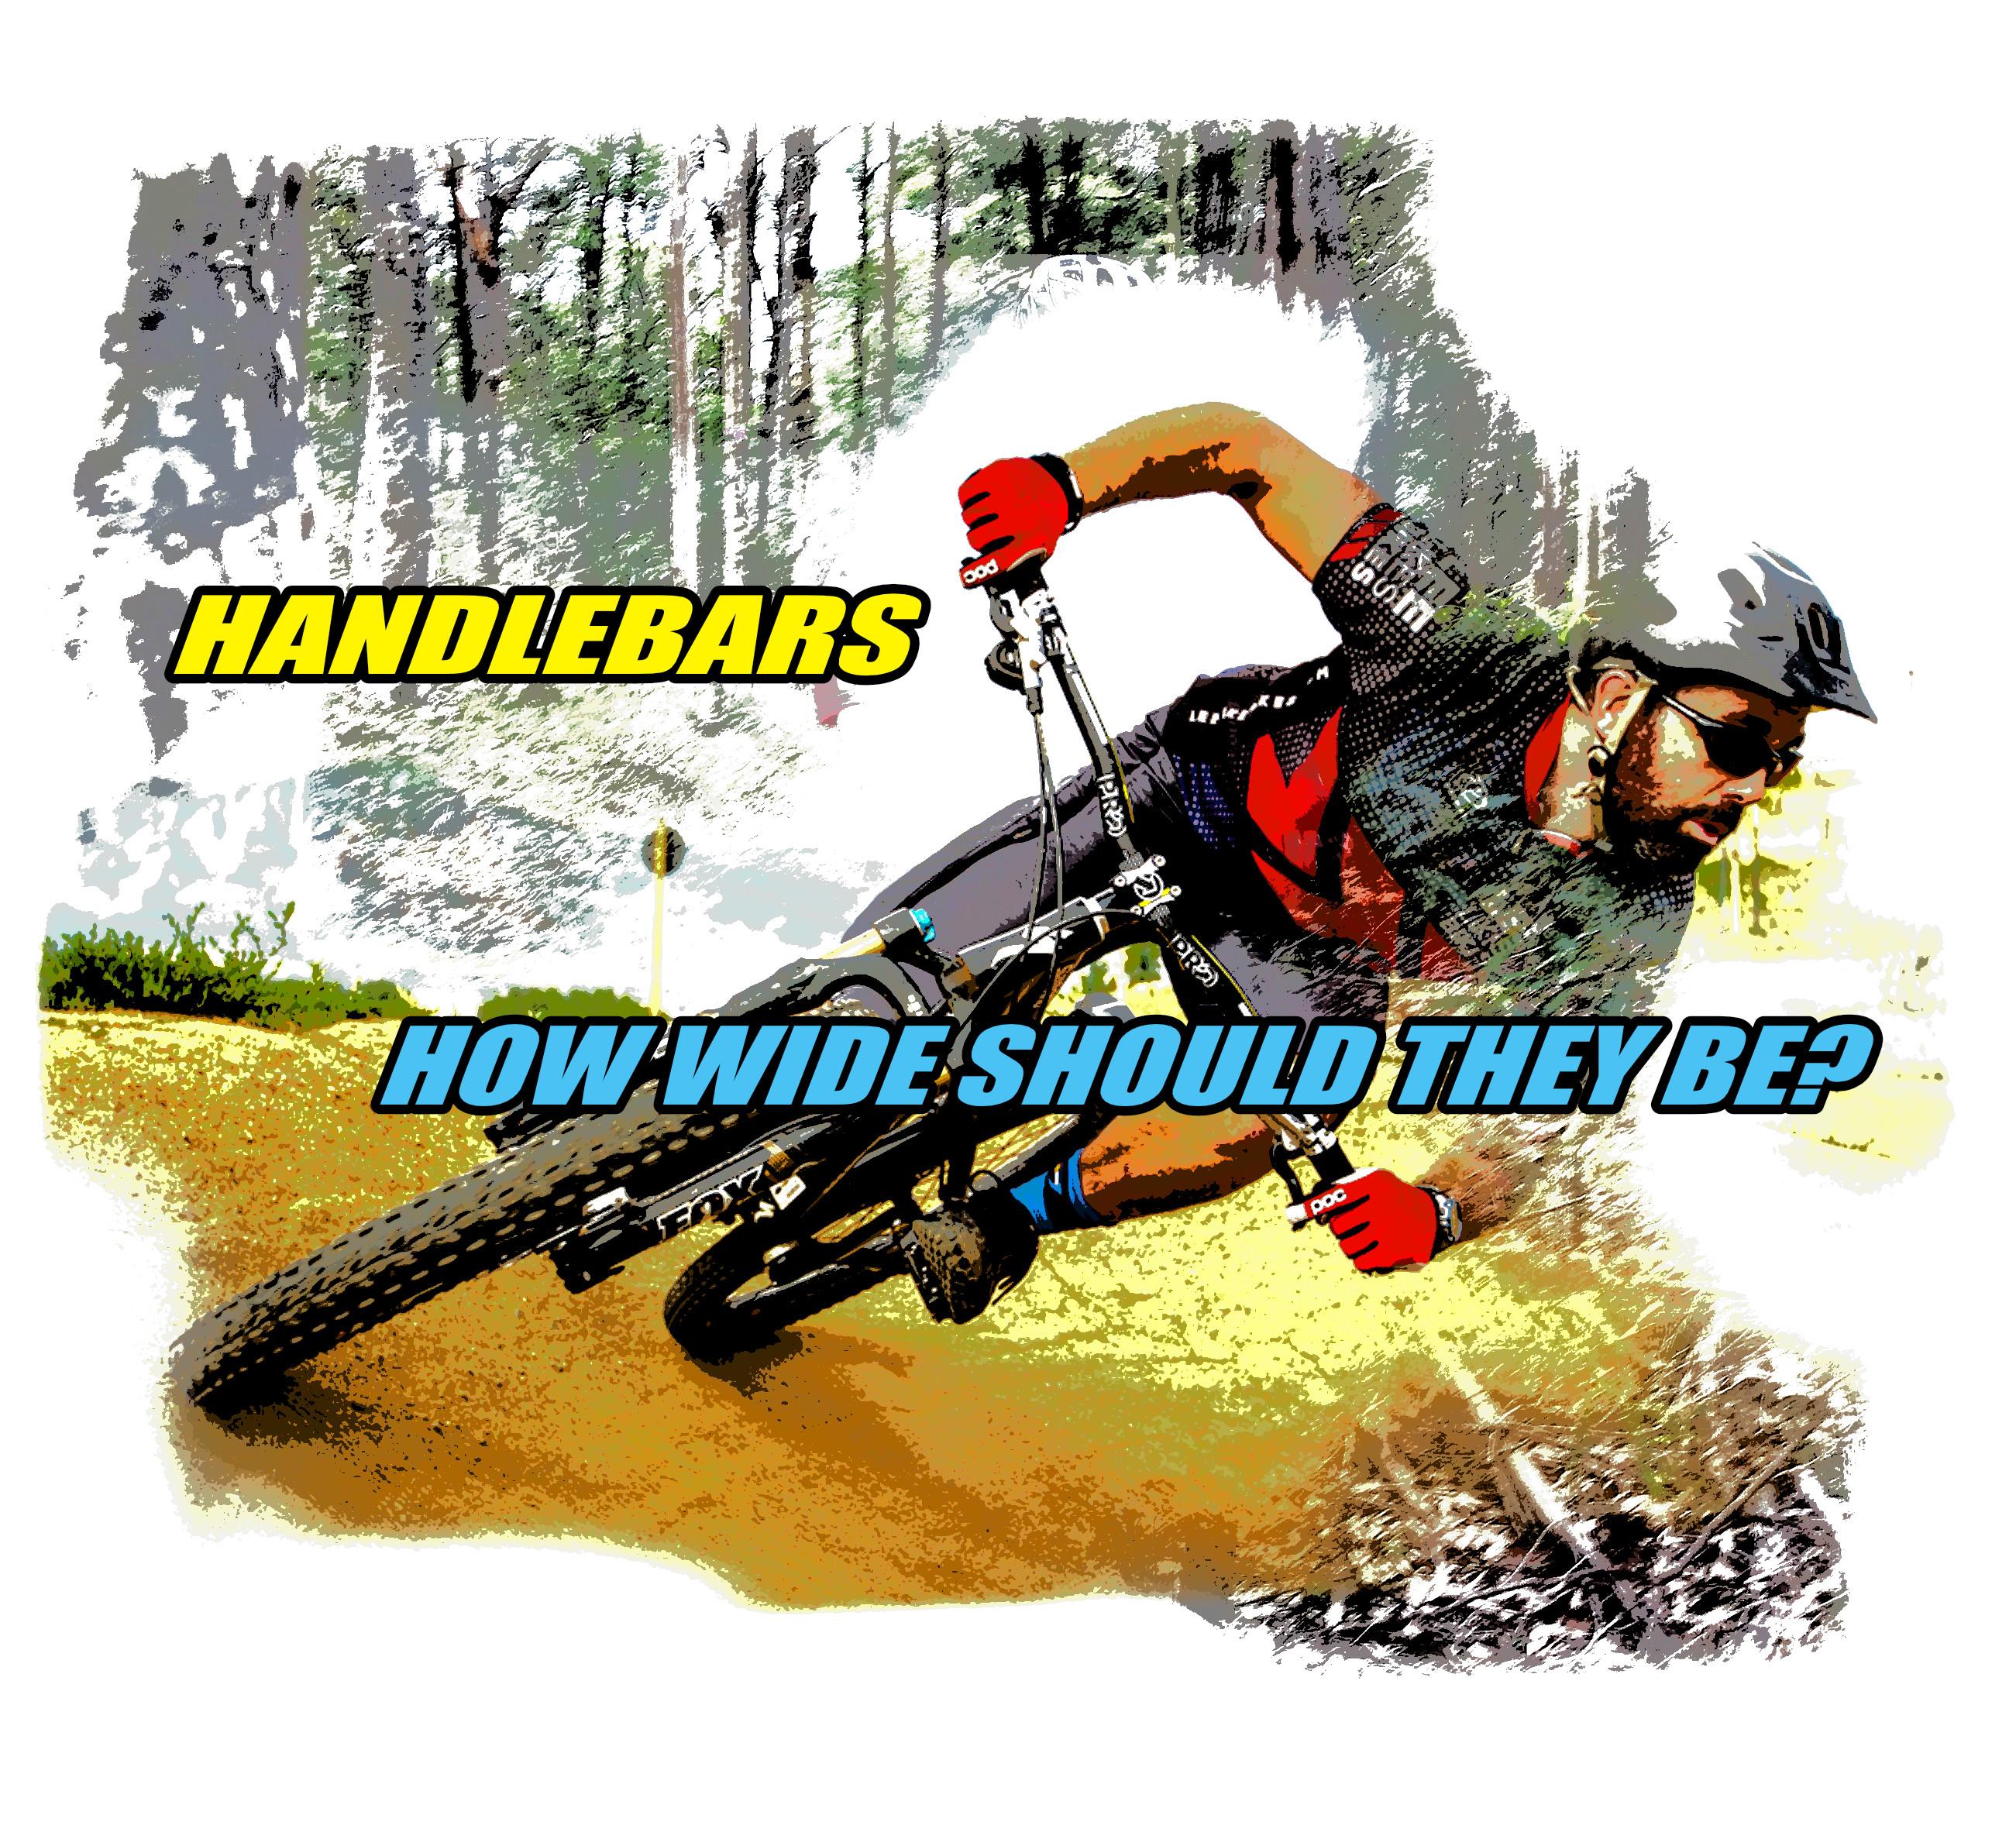 mtb handlebars momentum is your friend